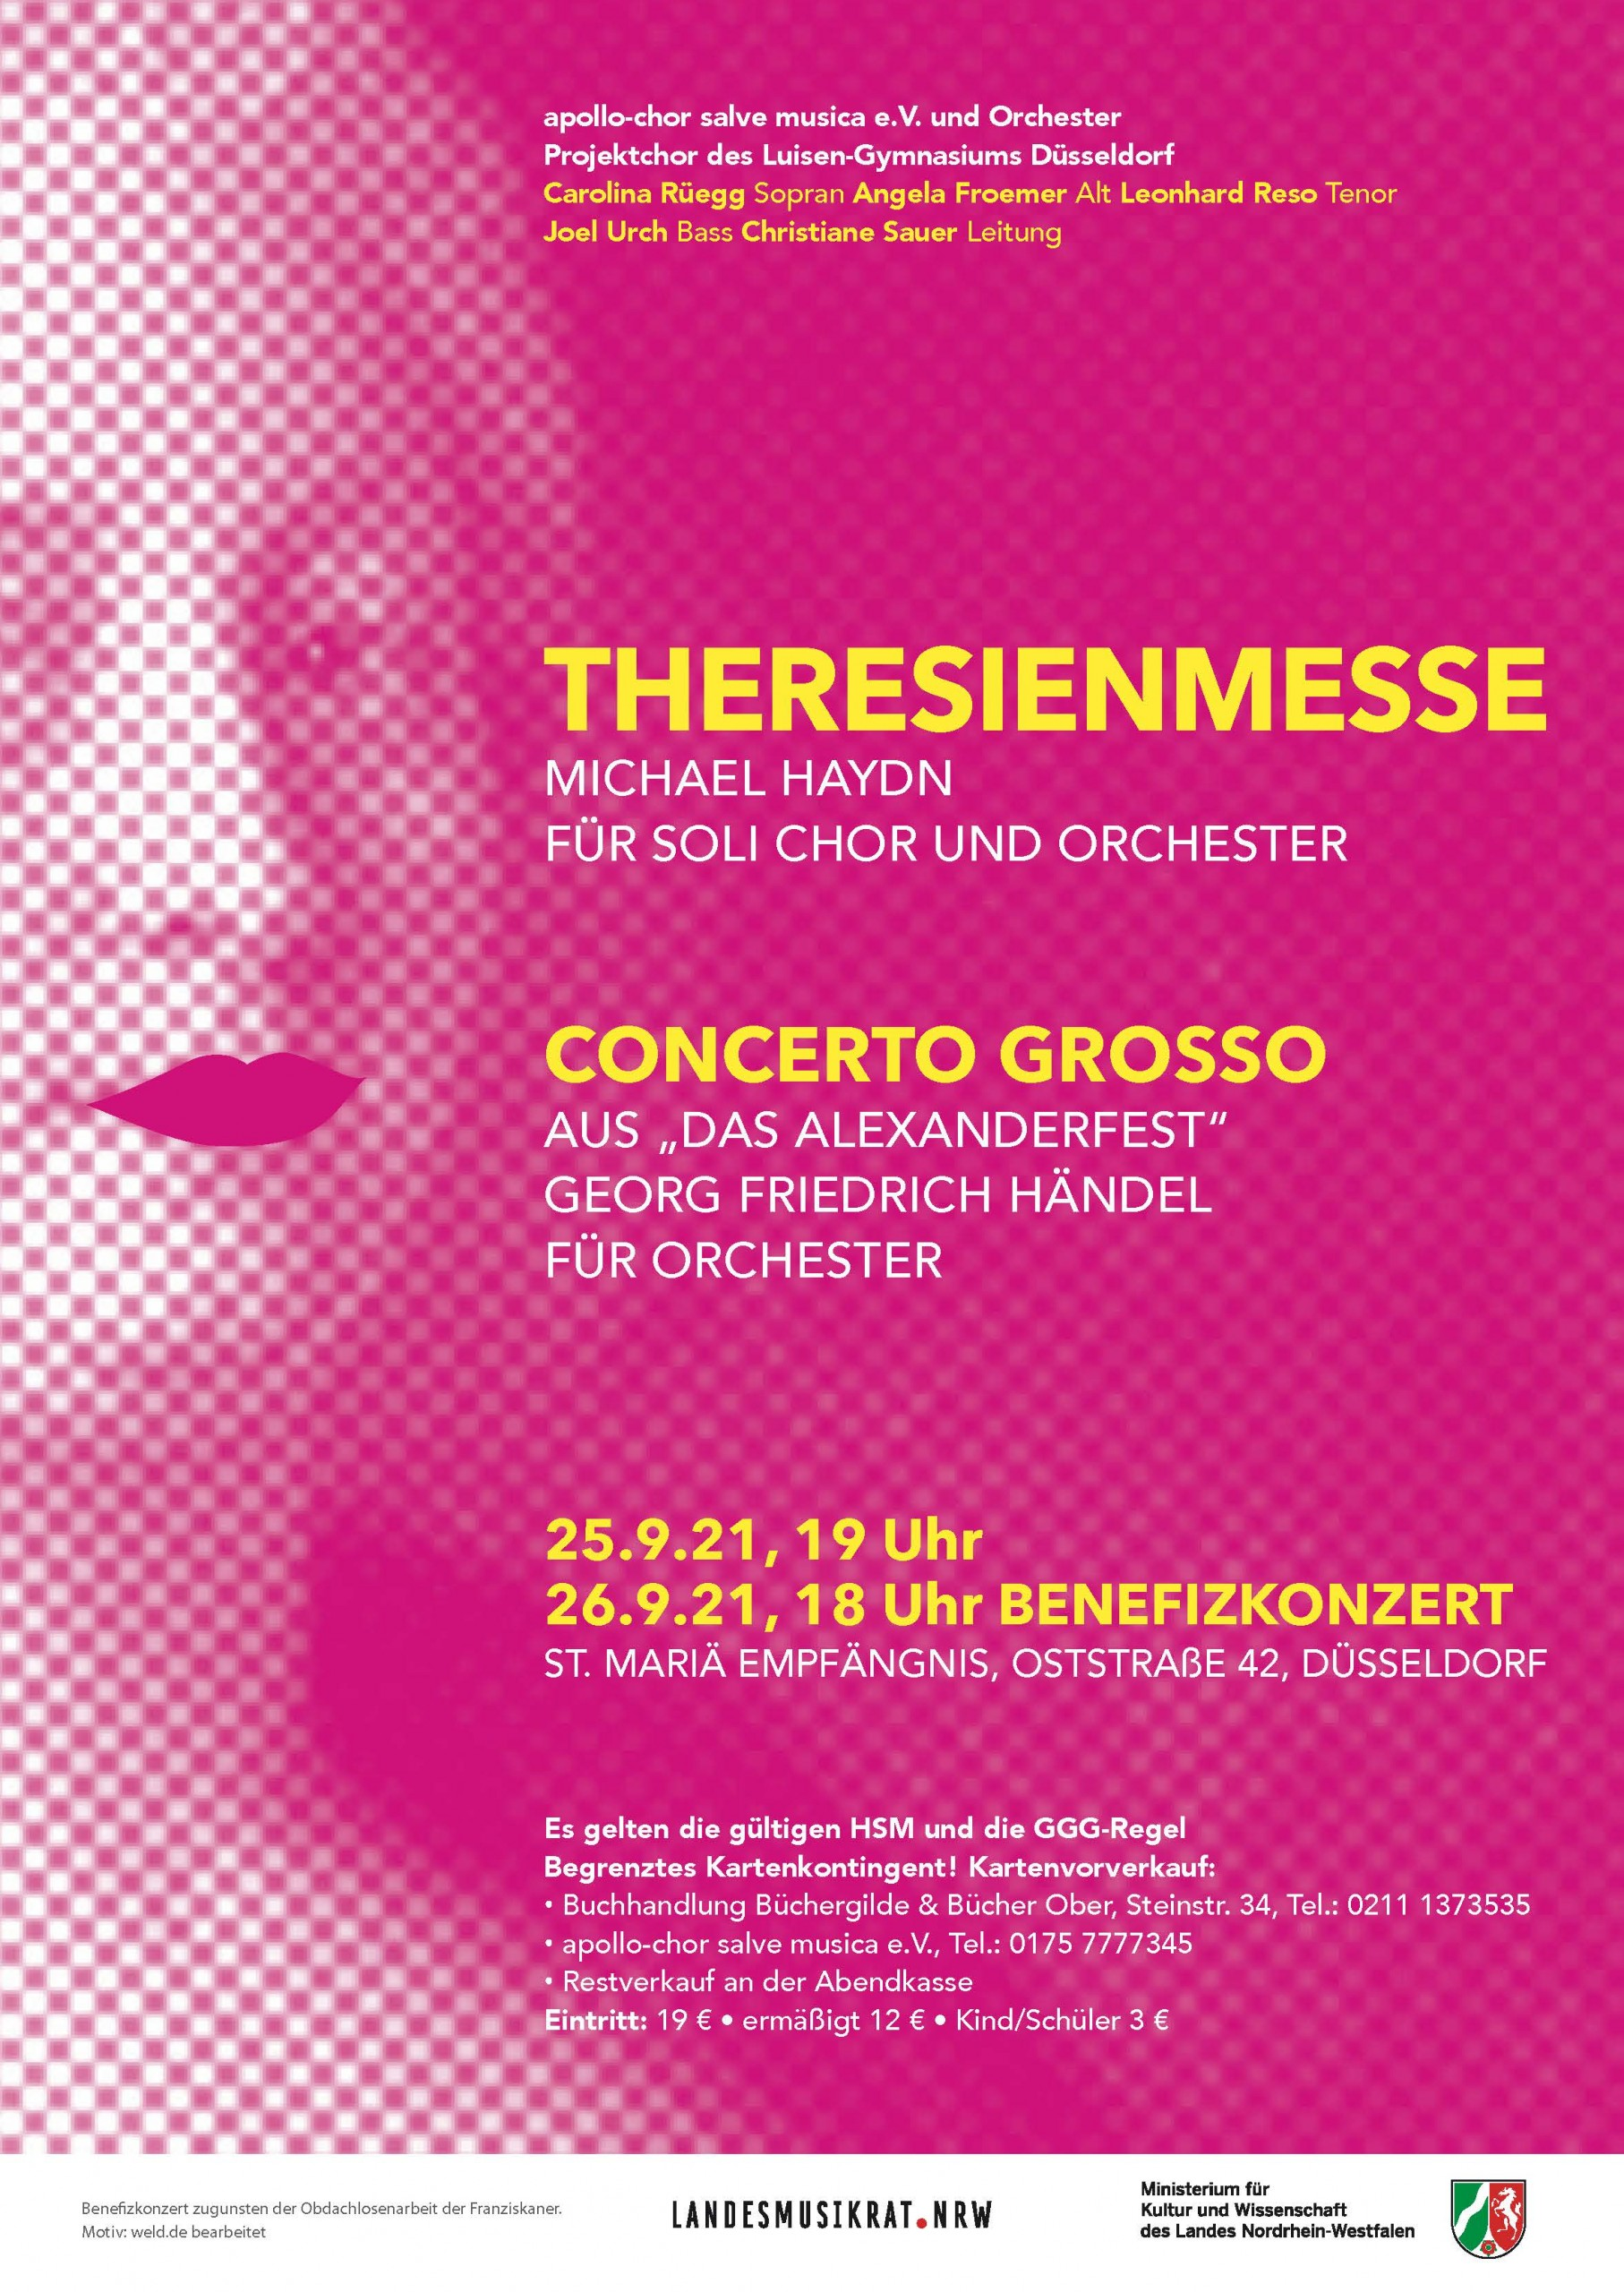 Theresienmesse